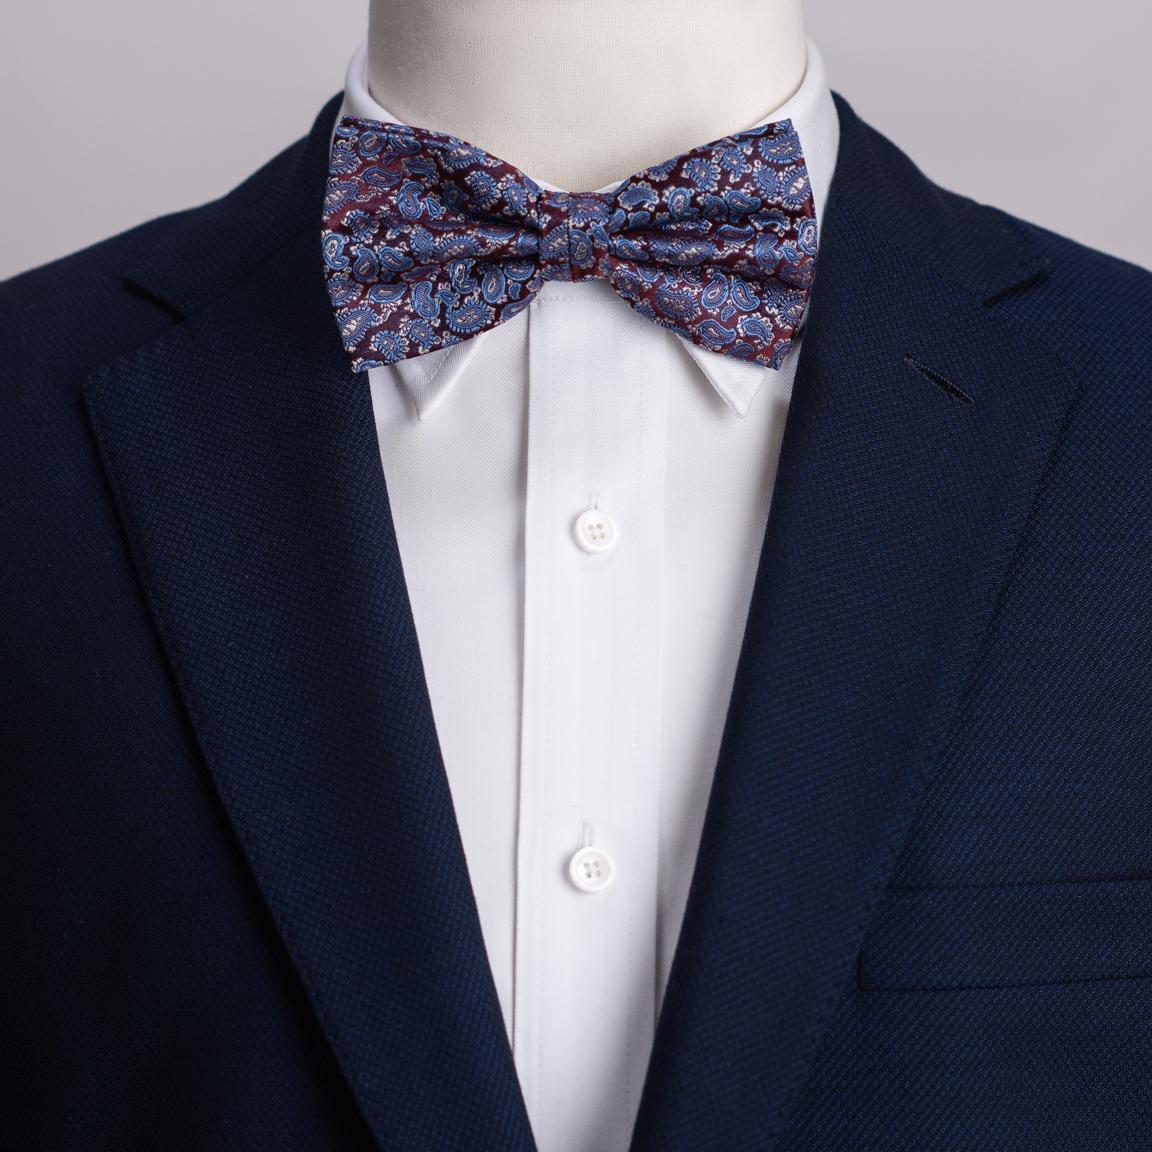 Wine & blue paisley bow tie